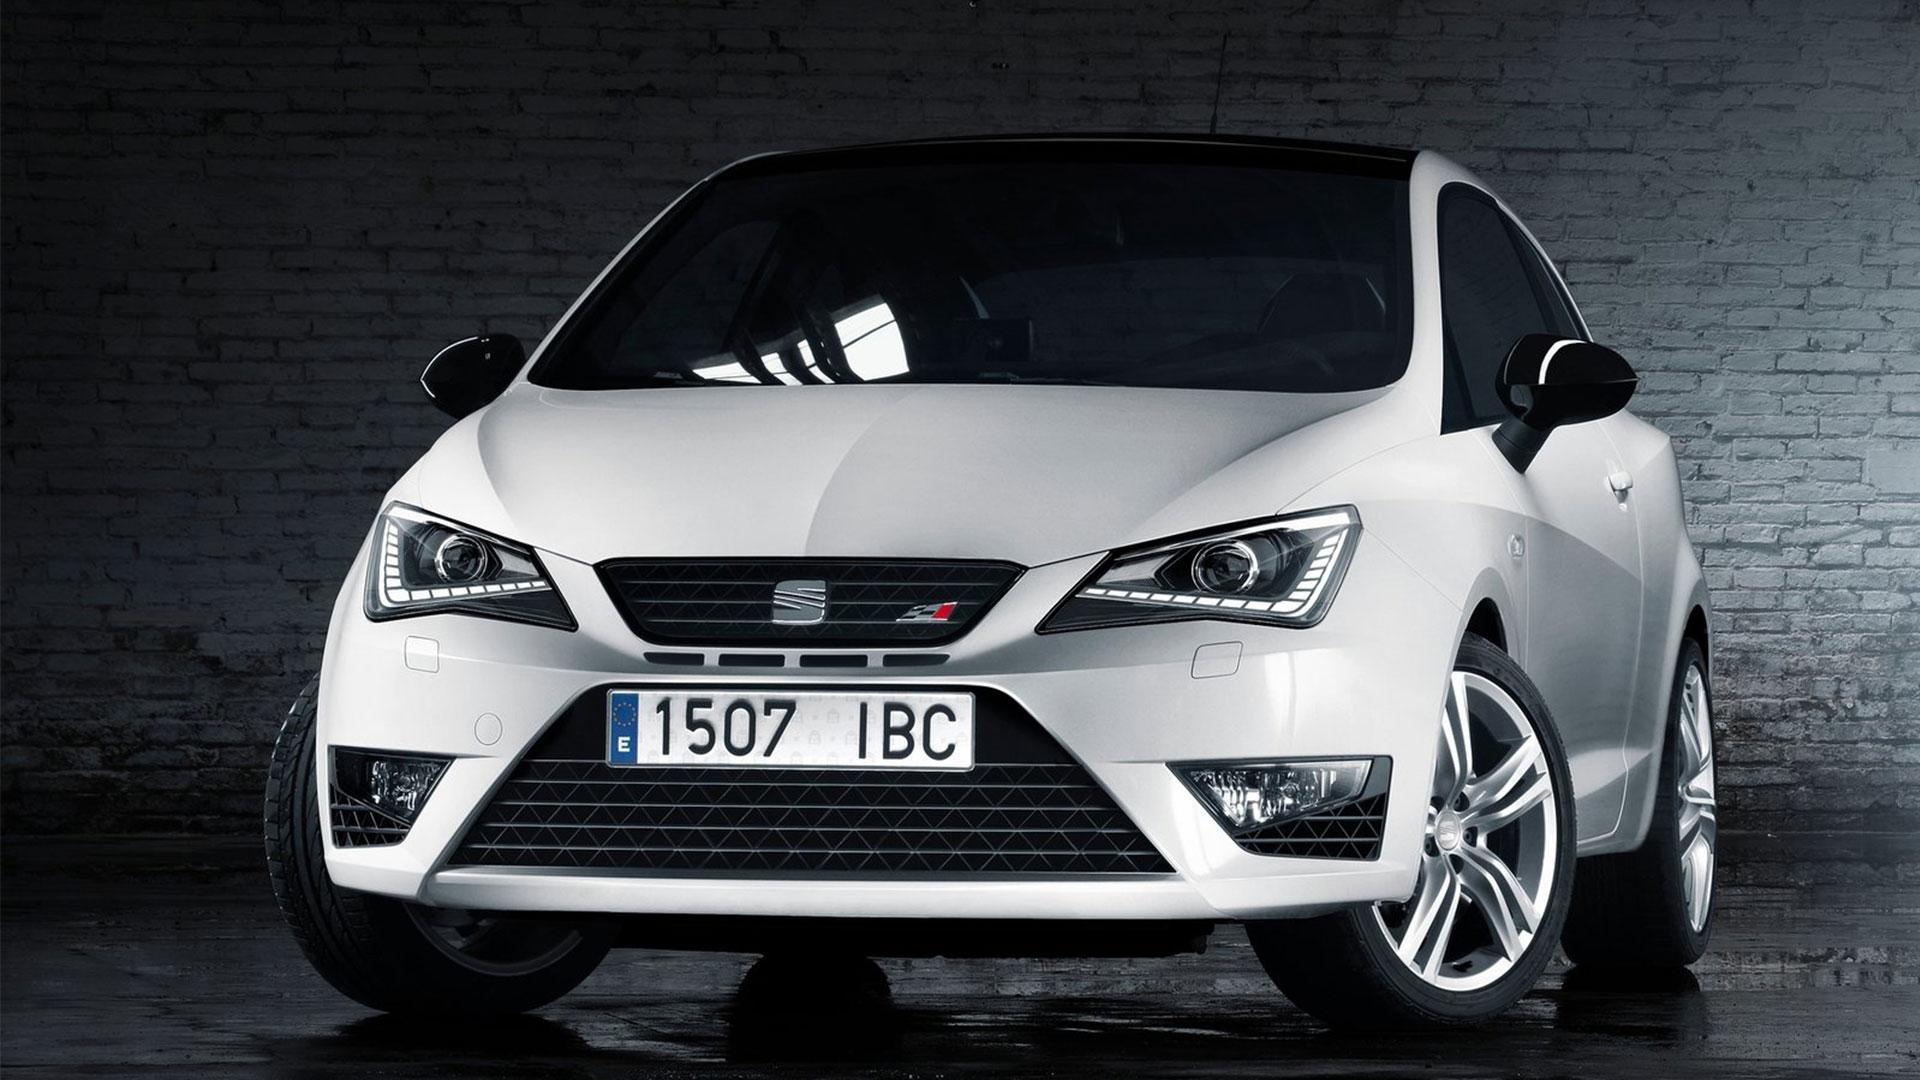 SEAT Ibiza 1.4 TSI (2014)